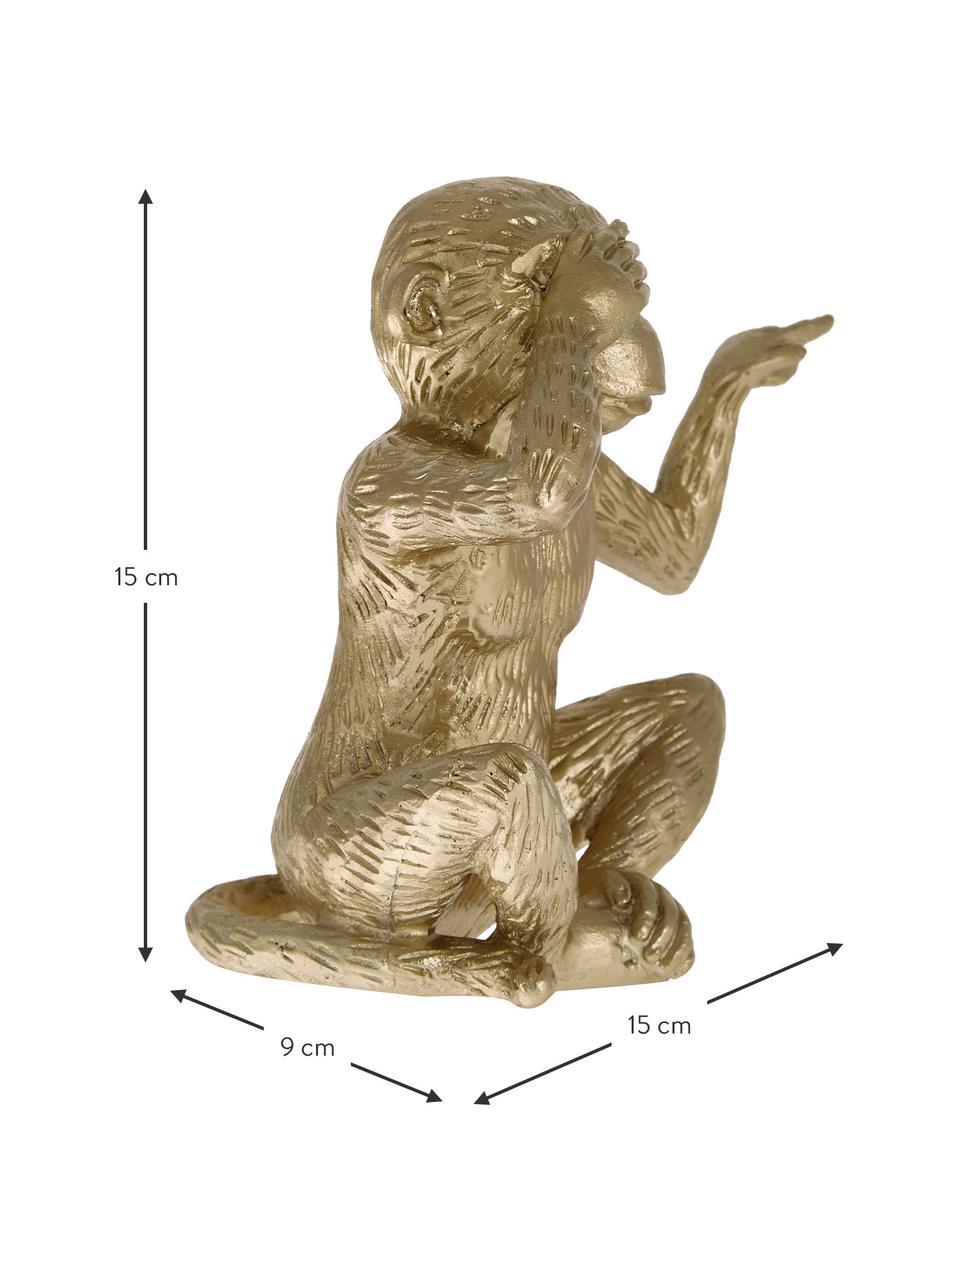 Decoratief object Monkey, Polyresin, Goudkleurig, 15 x 15 cm